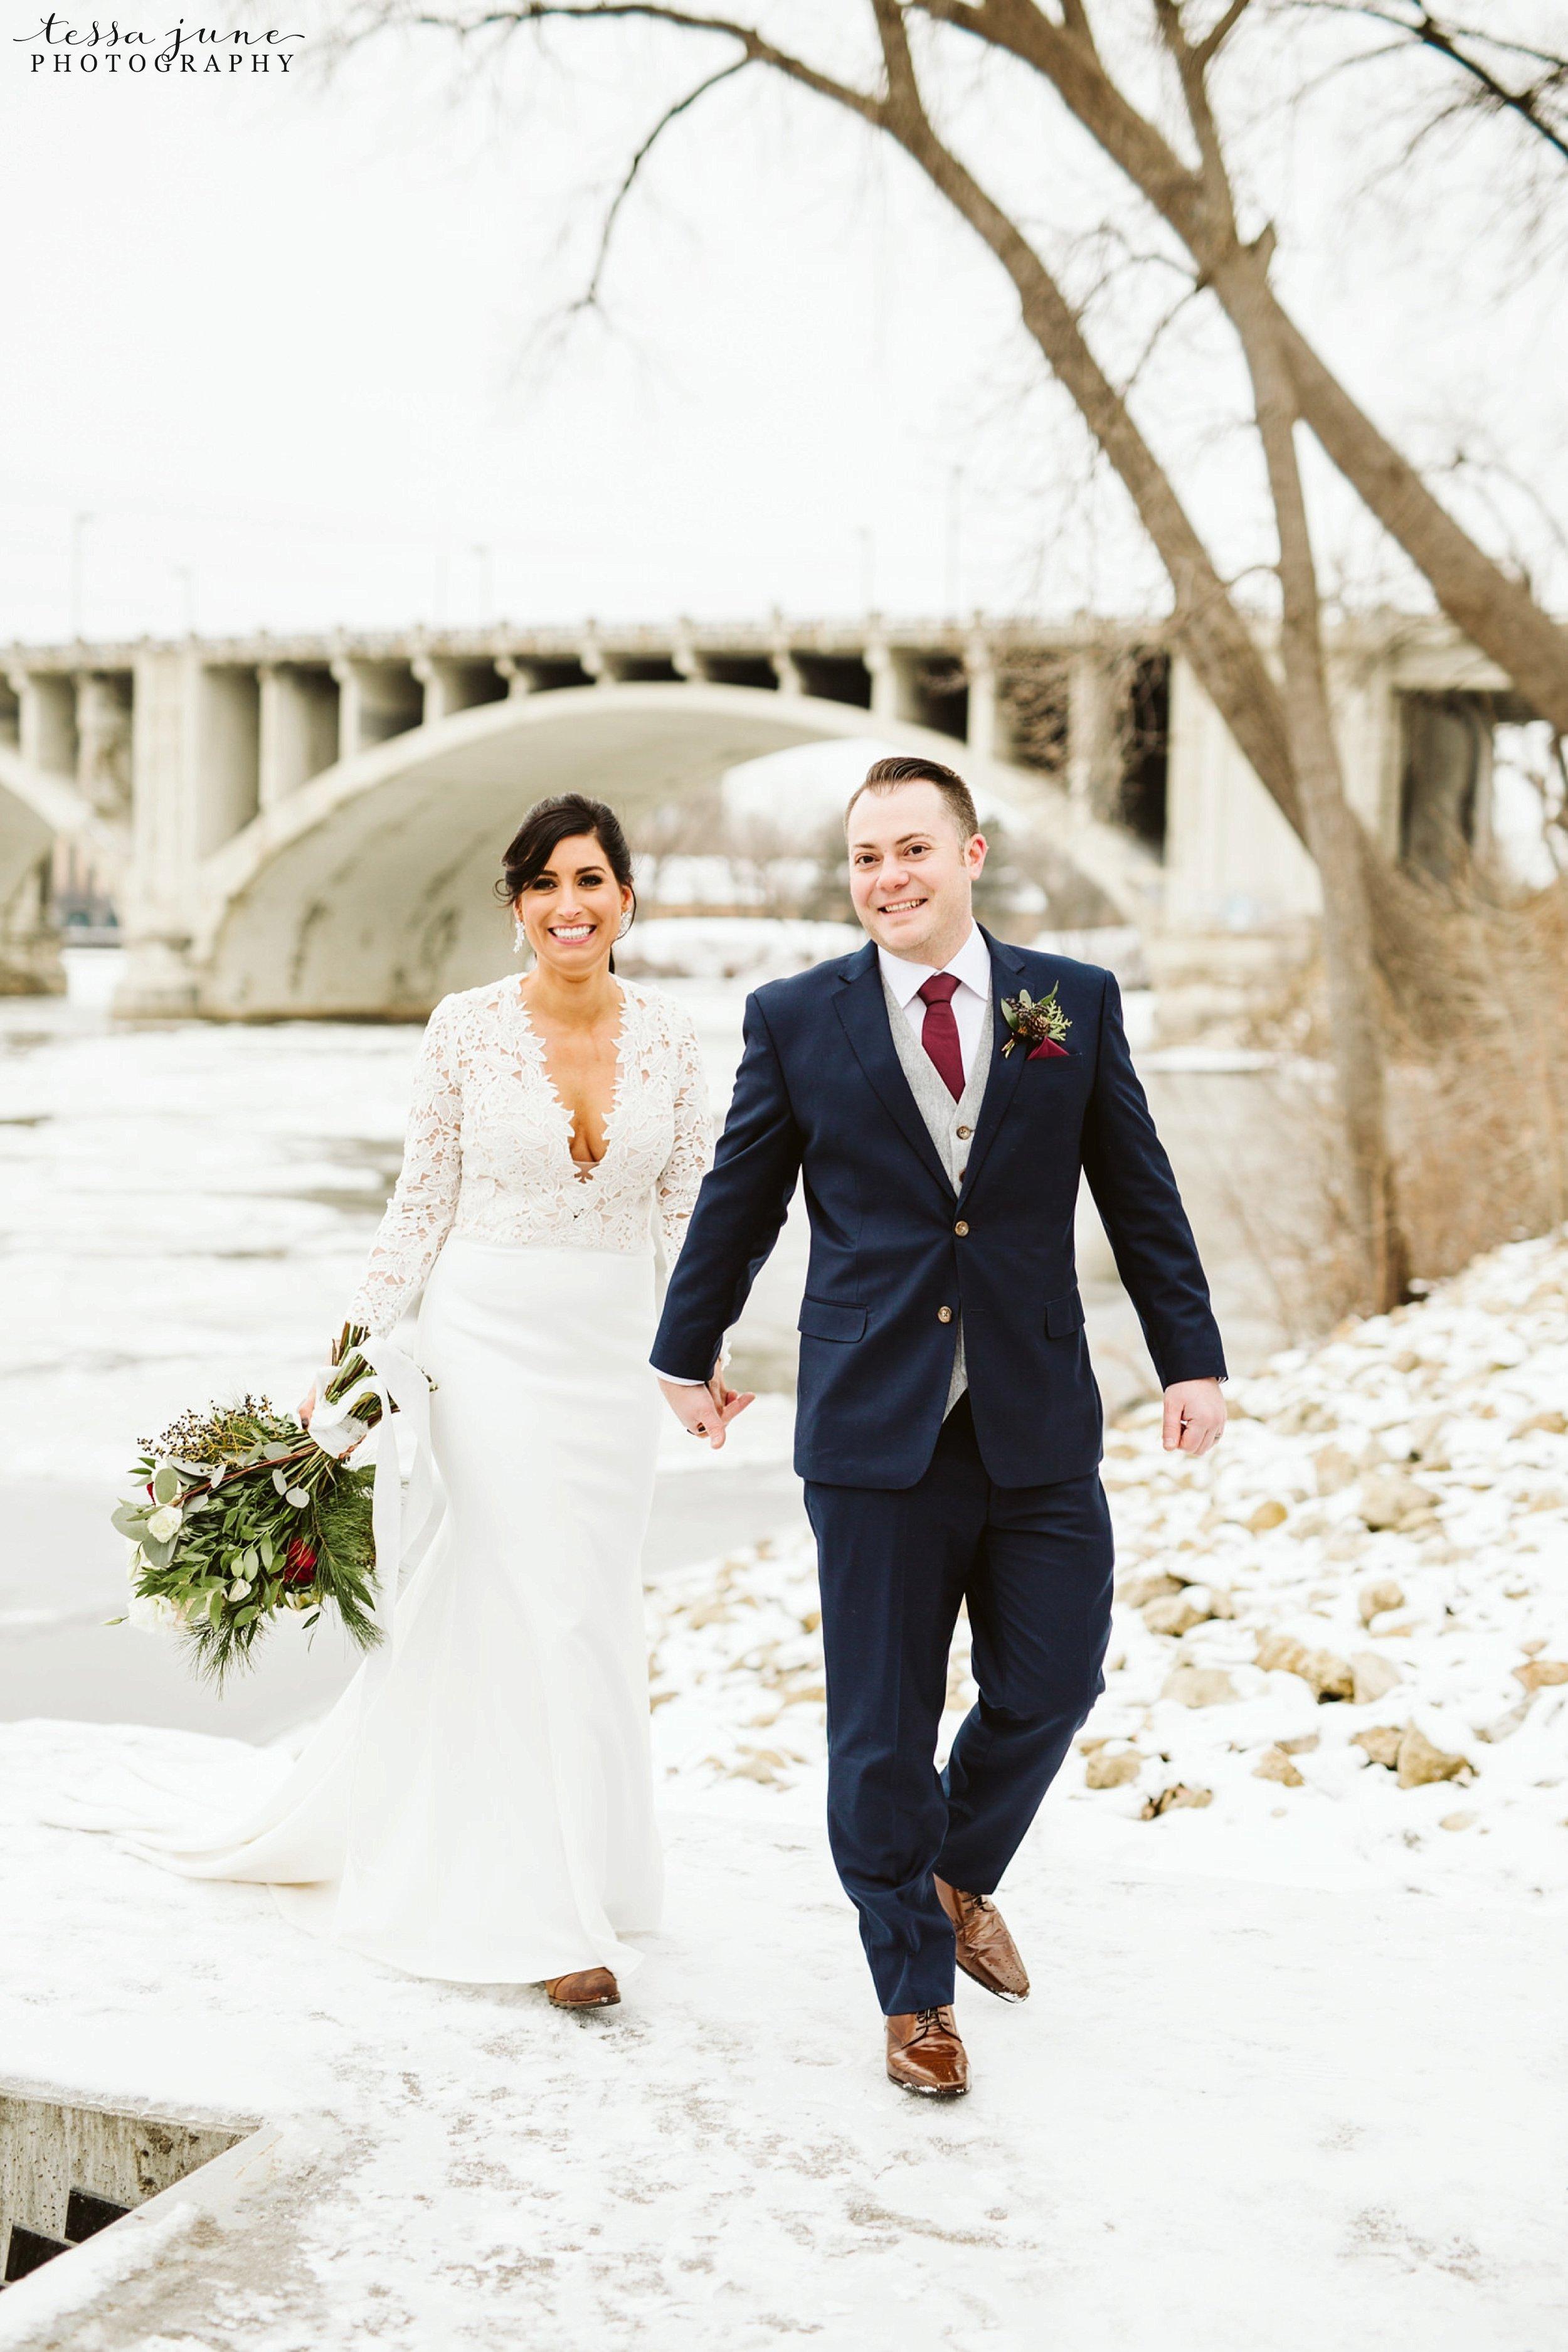 minneapolis-event-center-winter-romantic-snow-wedding-december-104.jpg